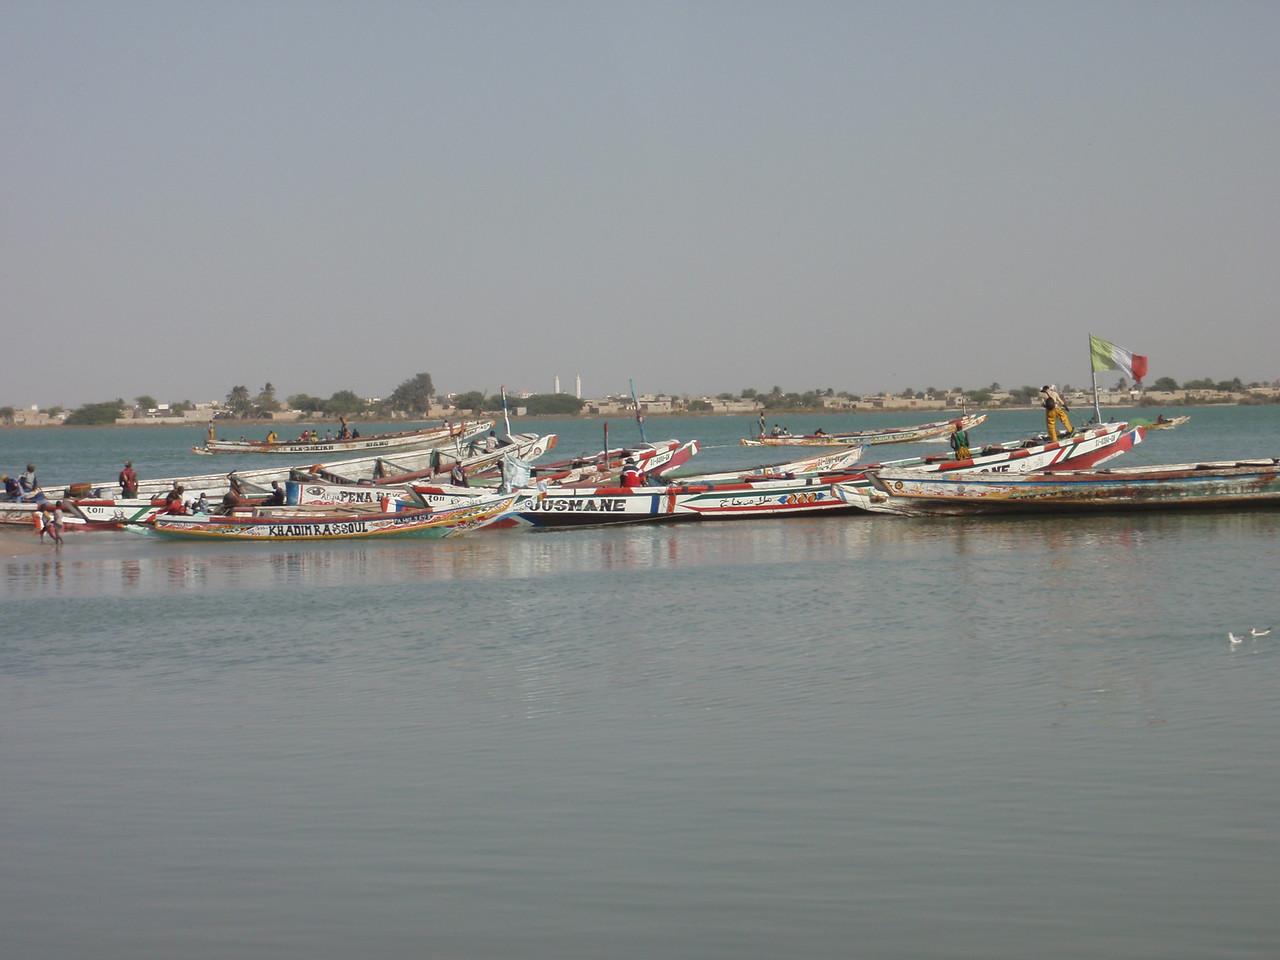 113_Guet Ndar  The Senegal River  Waiting to go-back Fishing